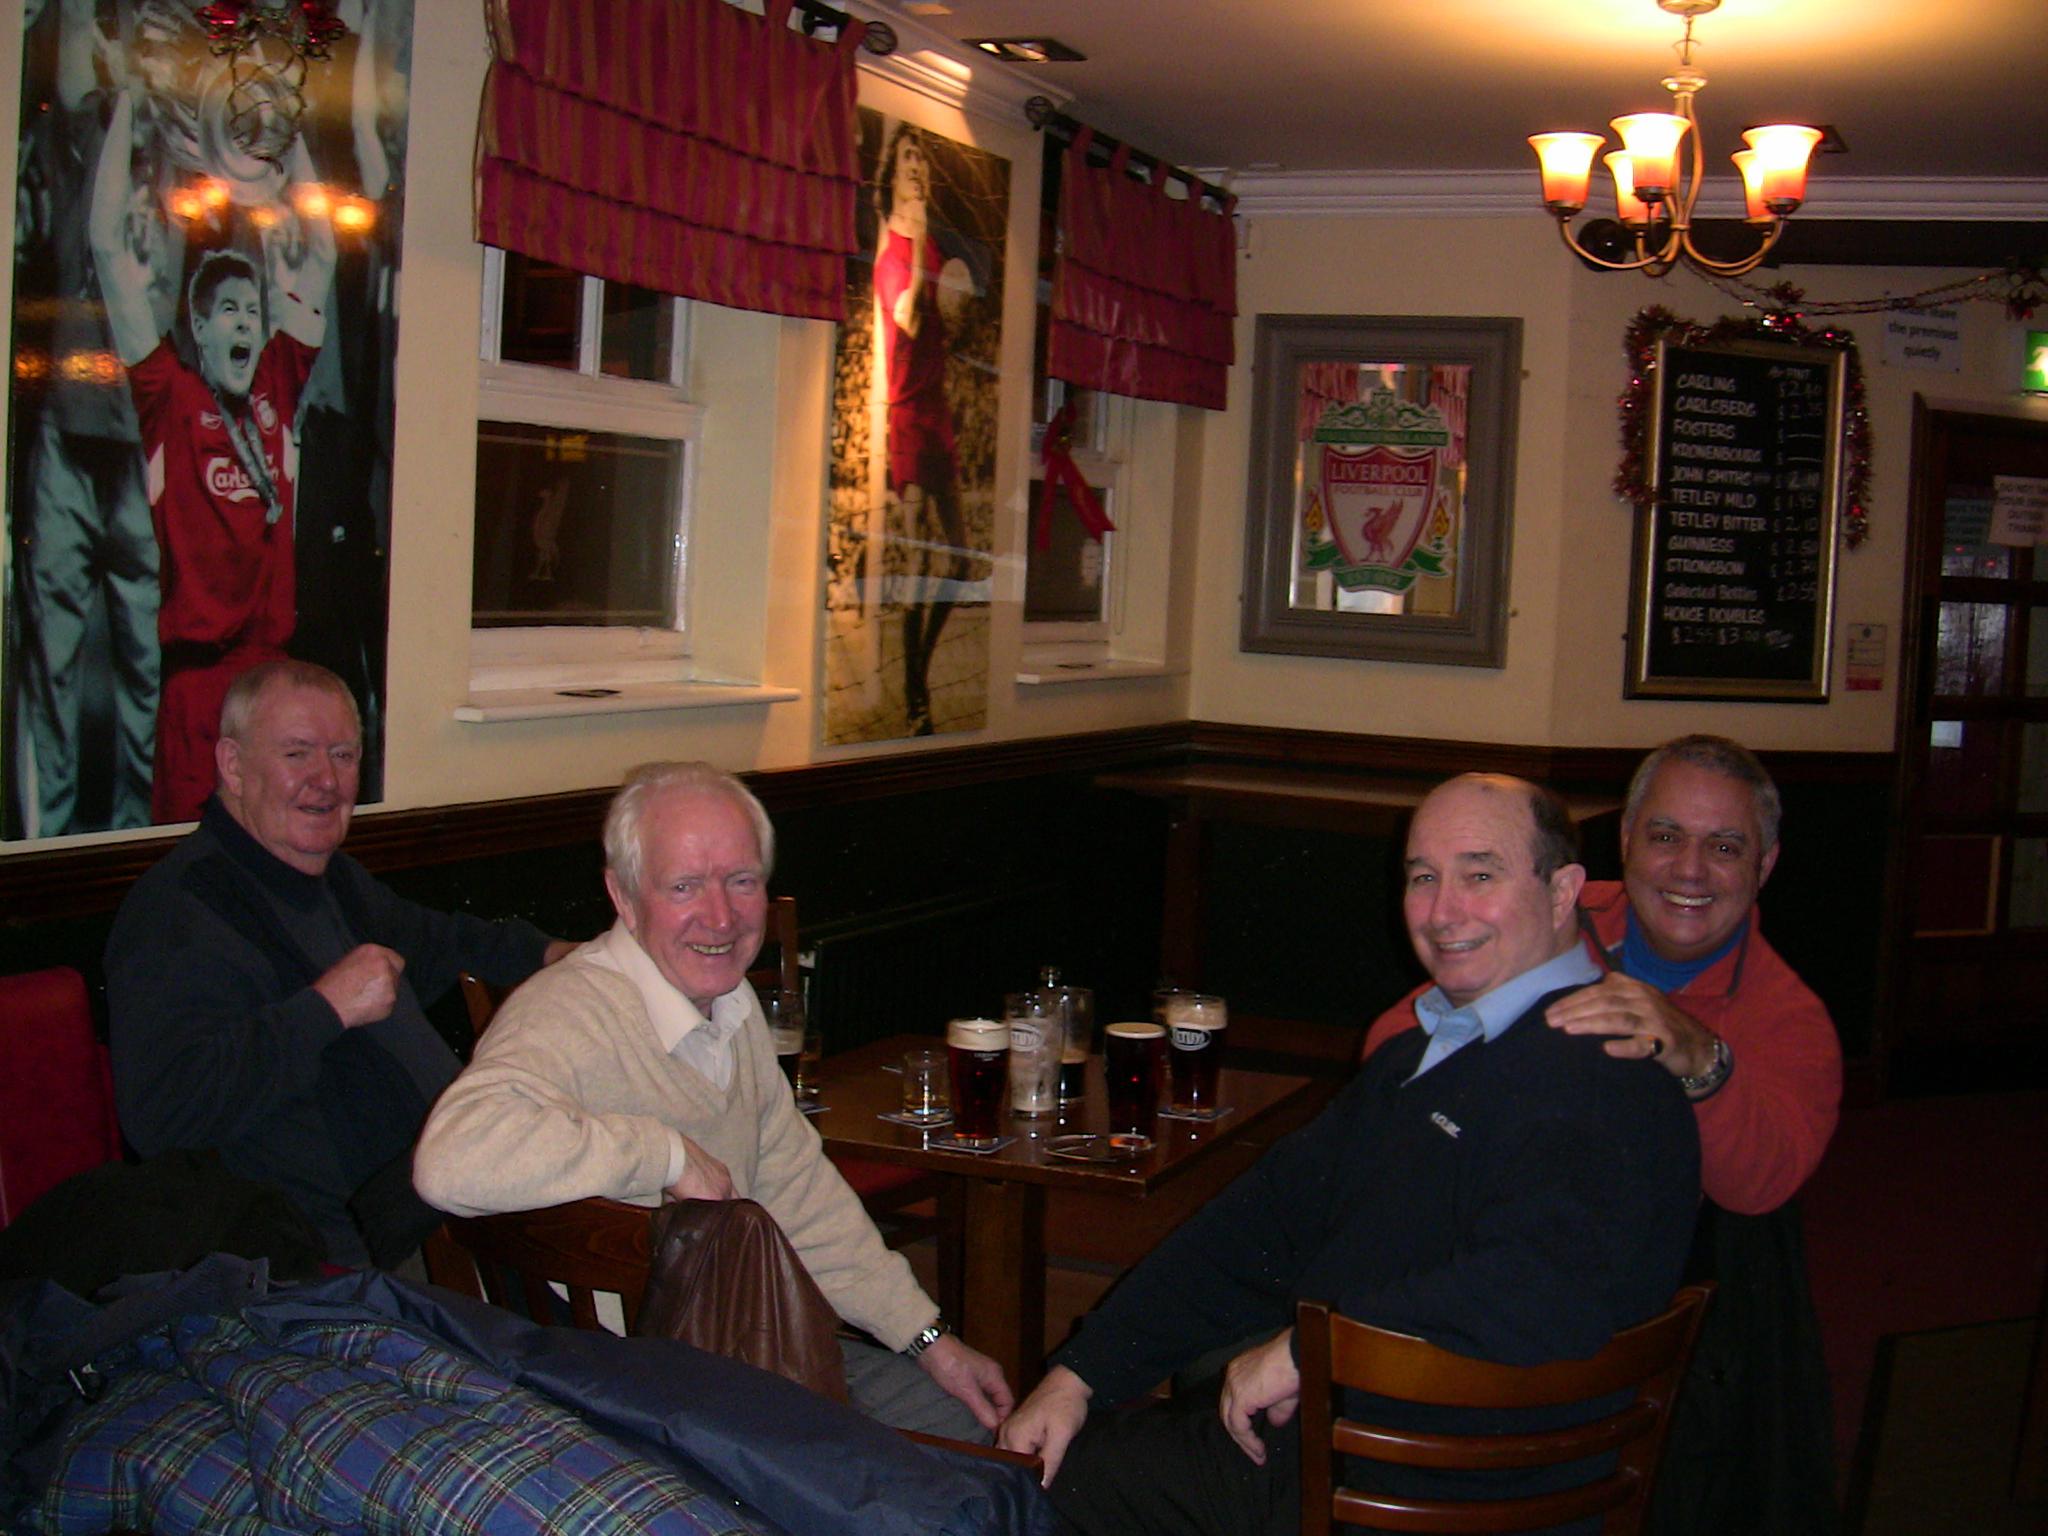 Barny, Joey, Boyley and Big Ton